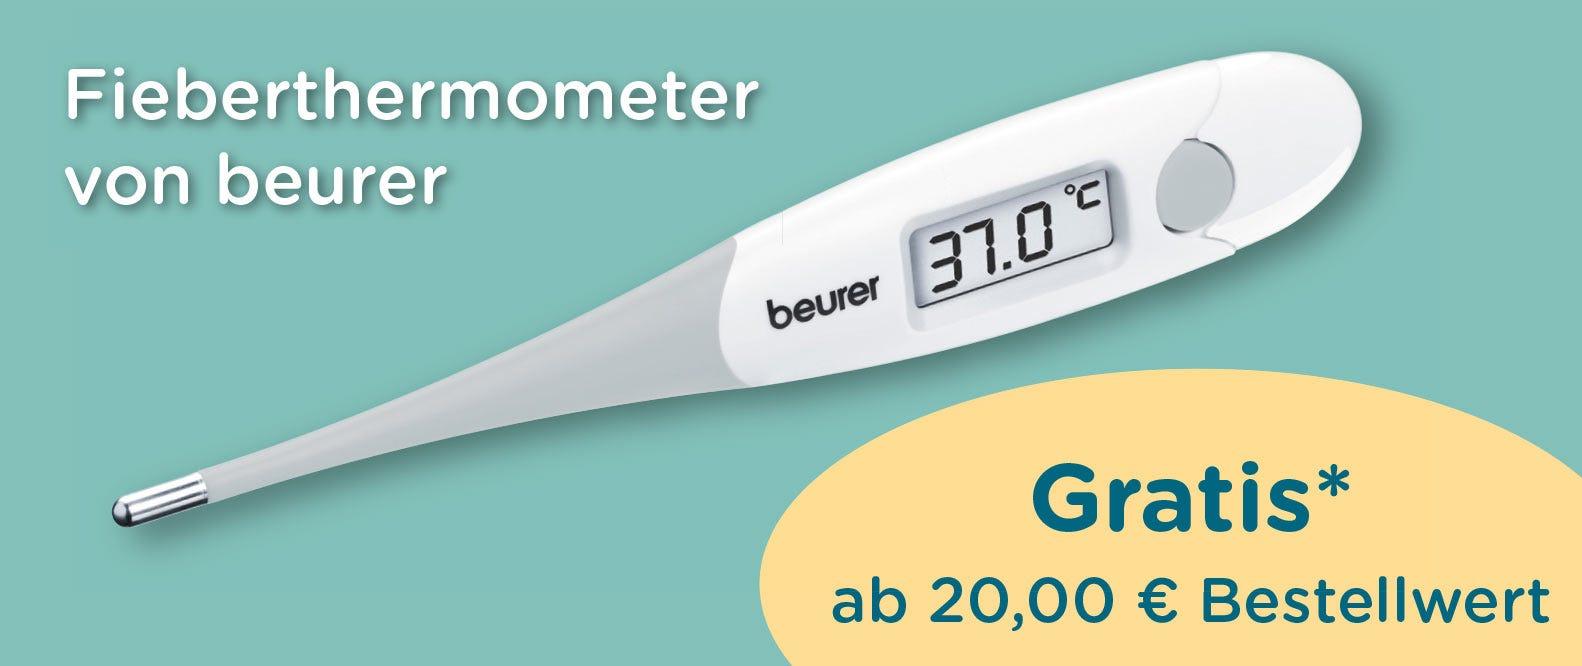 gratis Fieberthermometer